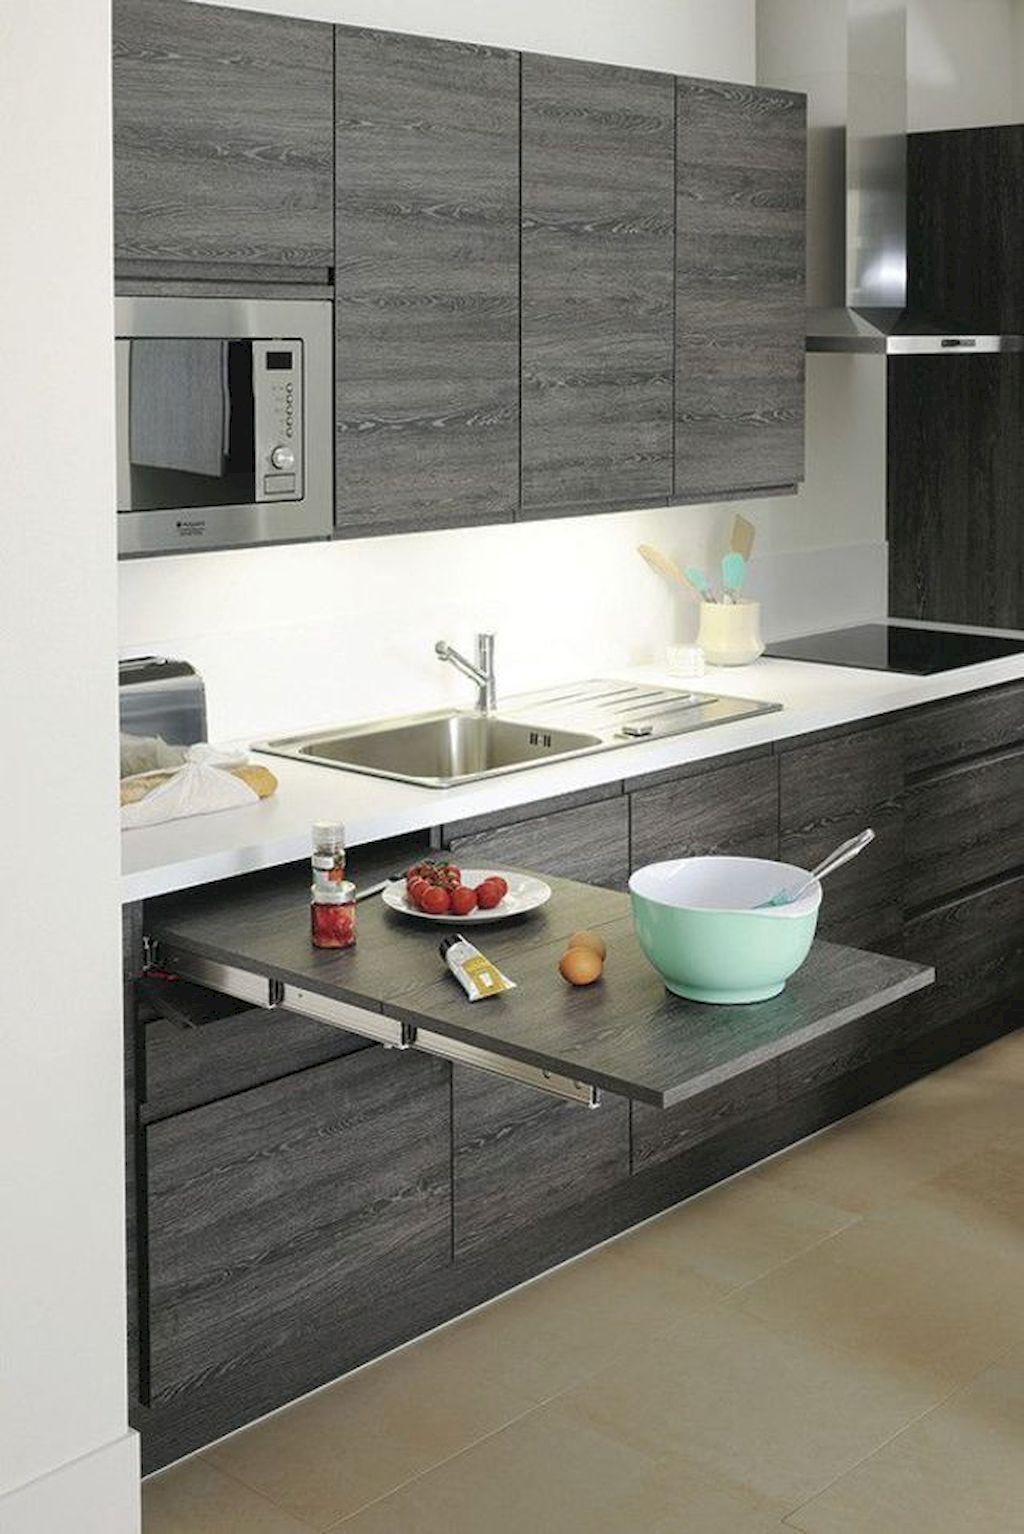 60 Genius Small Kitchen Remodel Design Ideas #kitchenremodelsmall